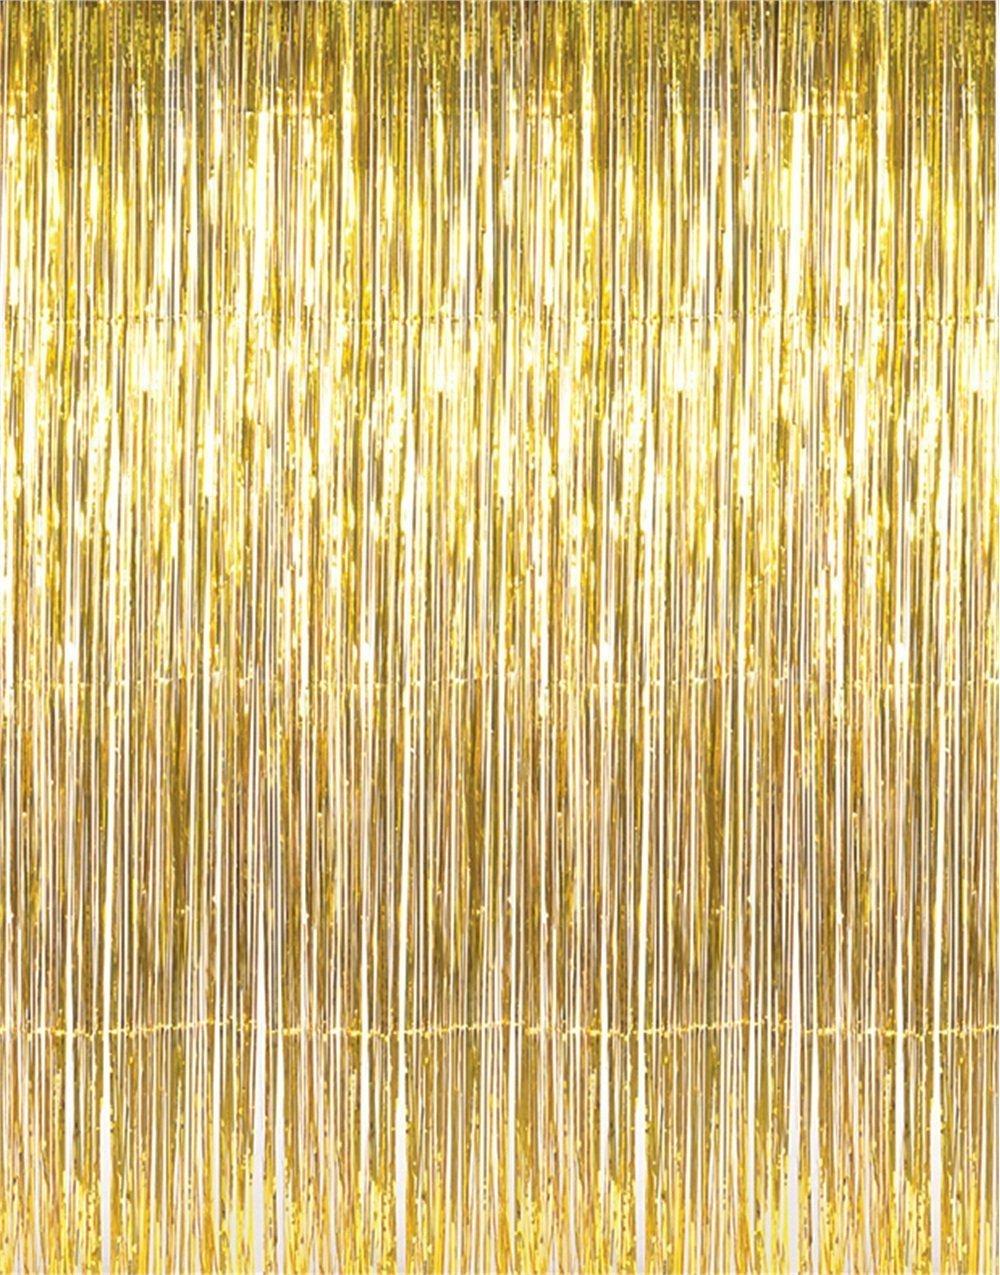 GOER 3.2 ft x 9.8 ft Metallic Tinsel Foil Fringe Curtains for Party Photo Backdrop Wedding Decor (Gold,5 pcs) by GOER